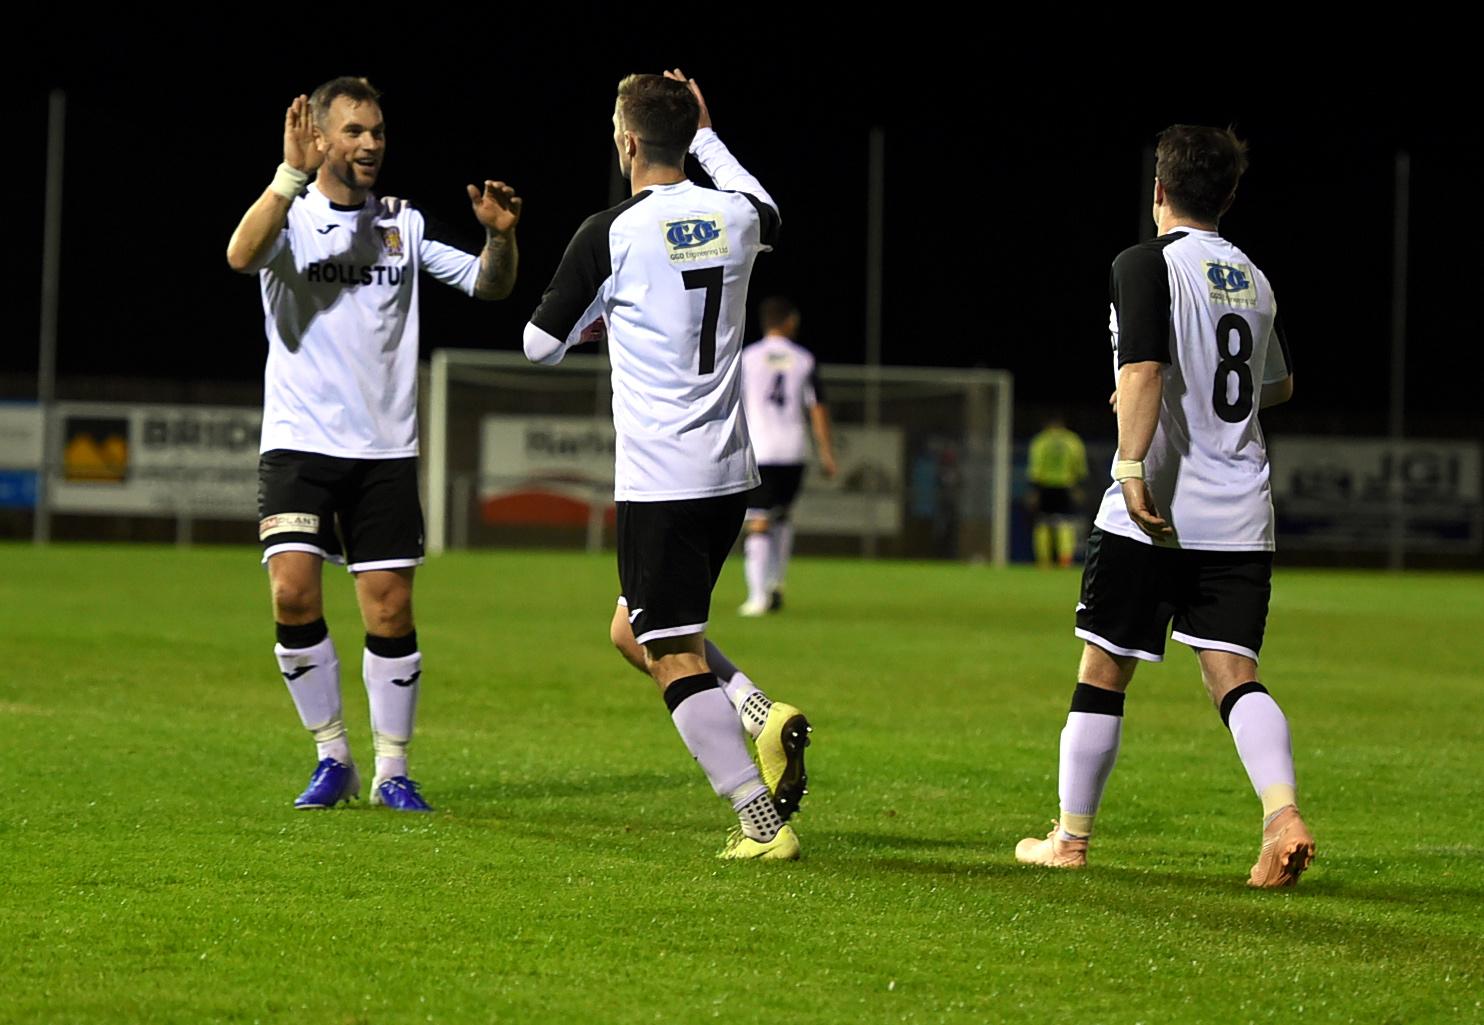 Graeme Rodger celebrates his goal.